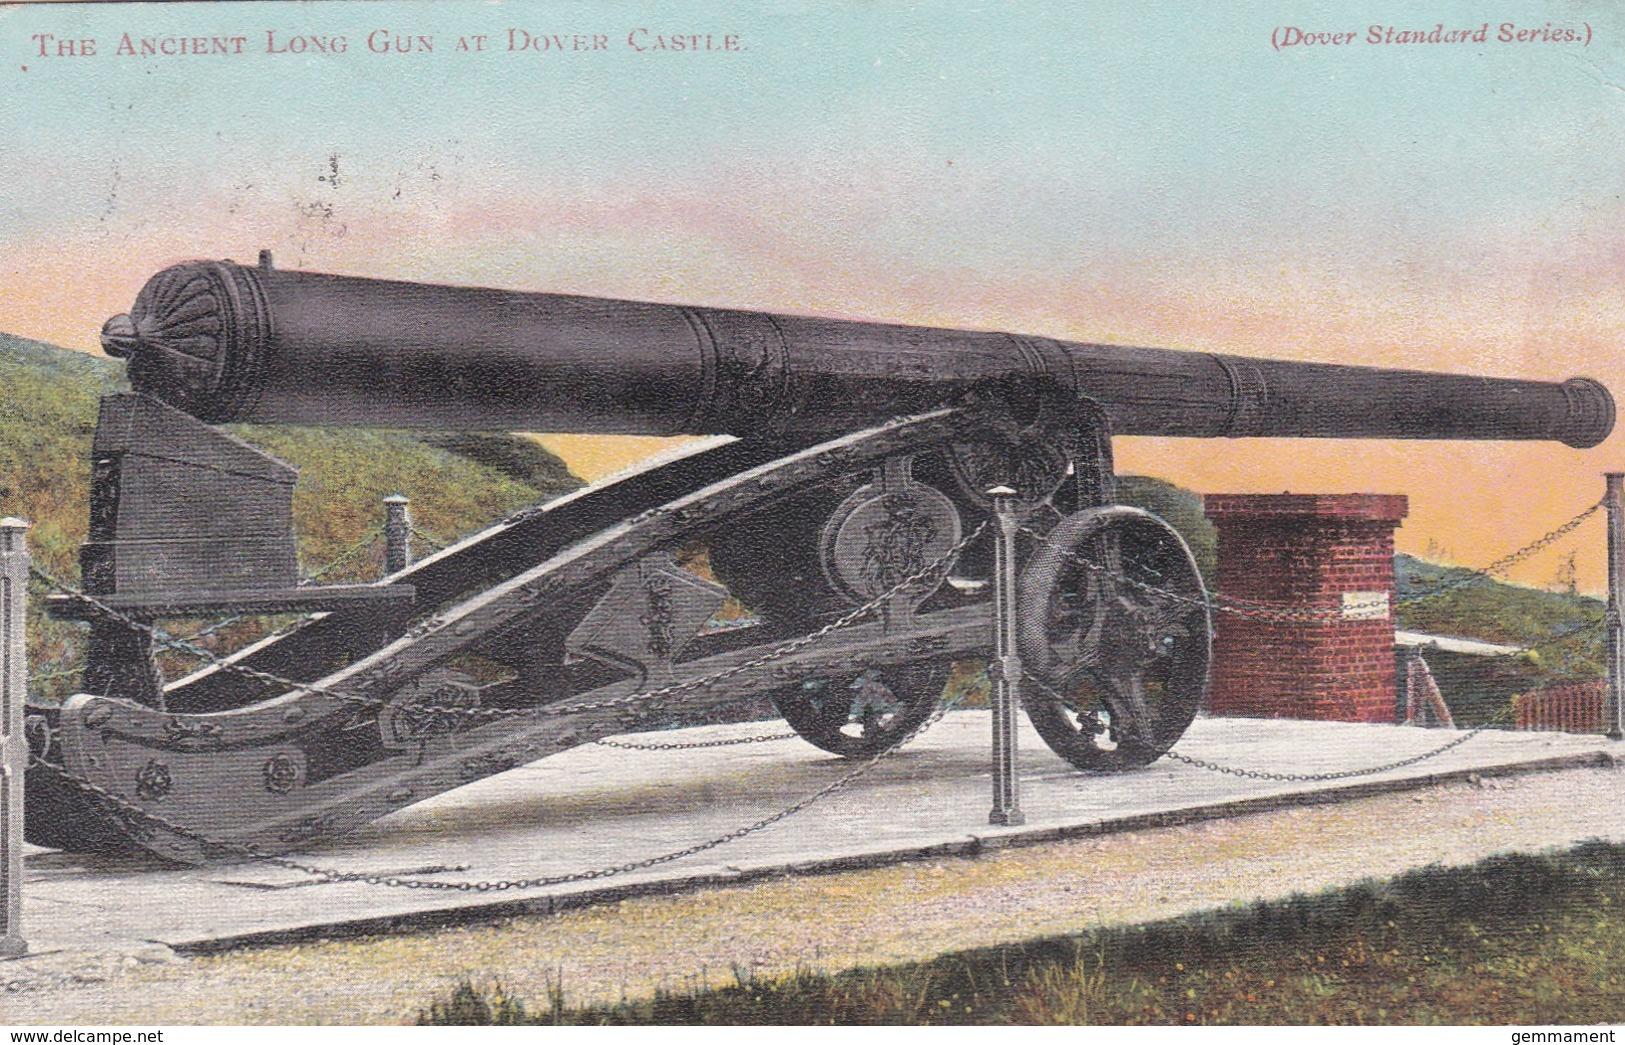 DOVER - THE ANCIENT LONG GUN AT DOVER CASTLE - Dover